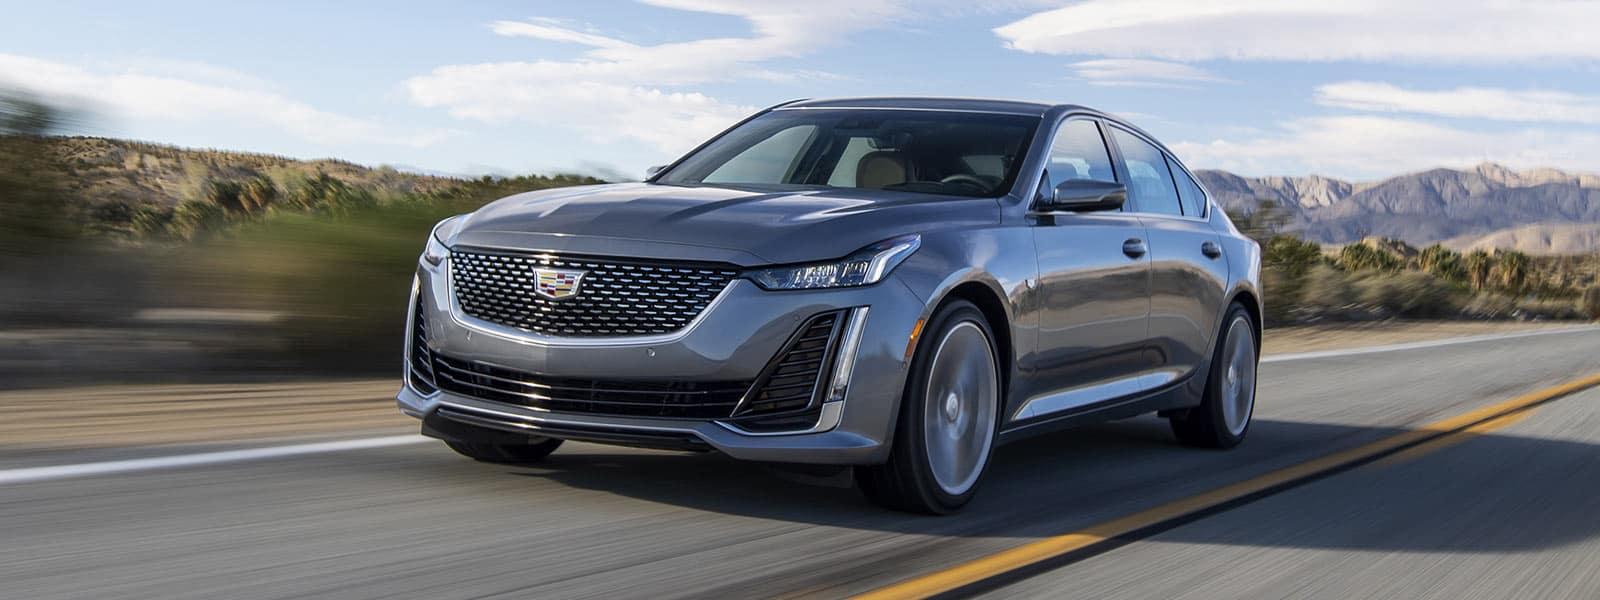 Buy or lease new 2021 Cadillac CT5 in Woodbridge Ontario